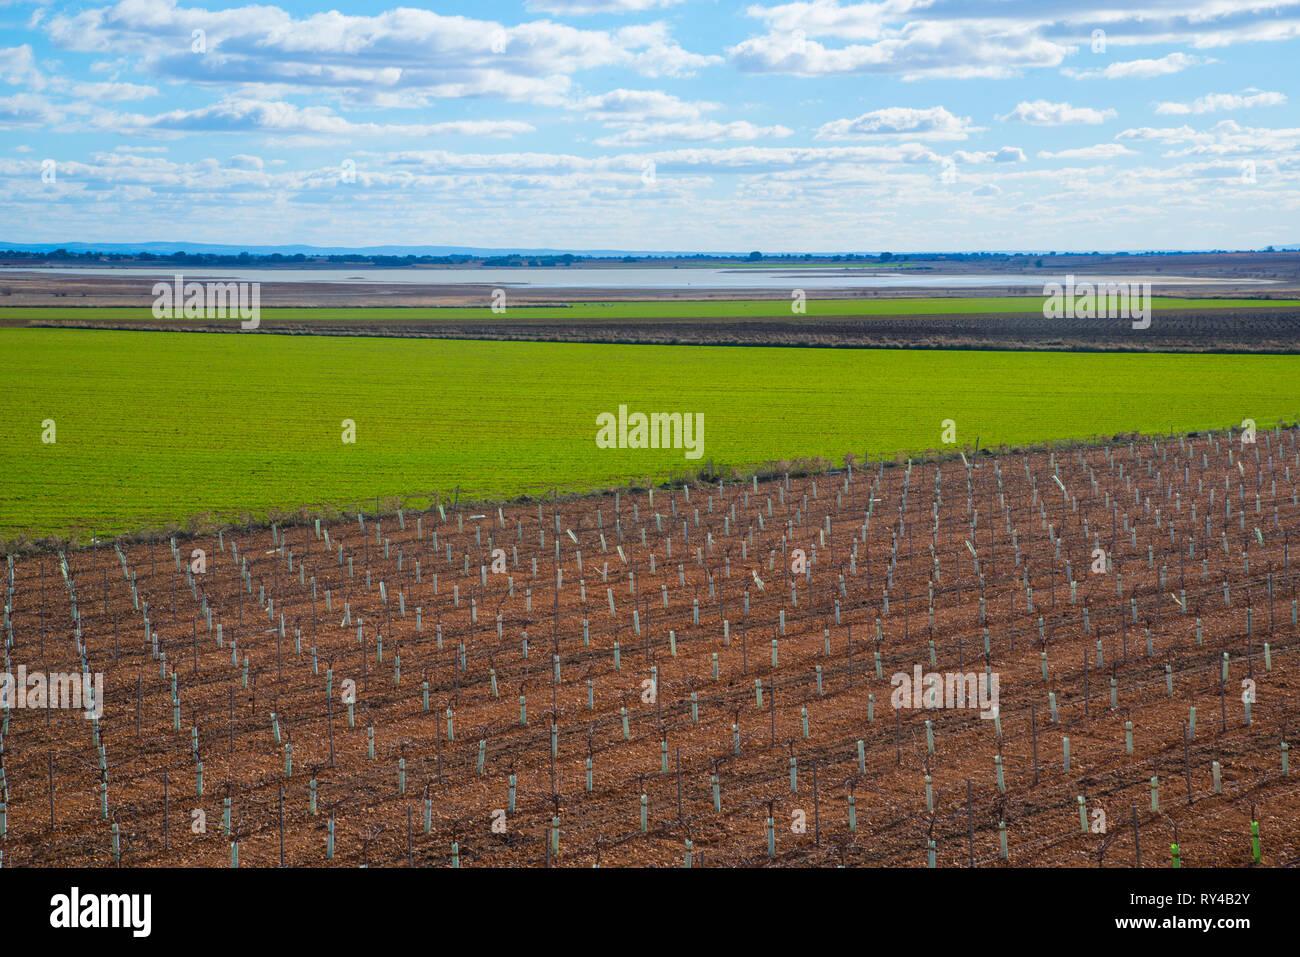 Cultivation field. Manjavacas, Cuenca province, Spain. - Stock Image